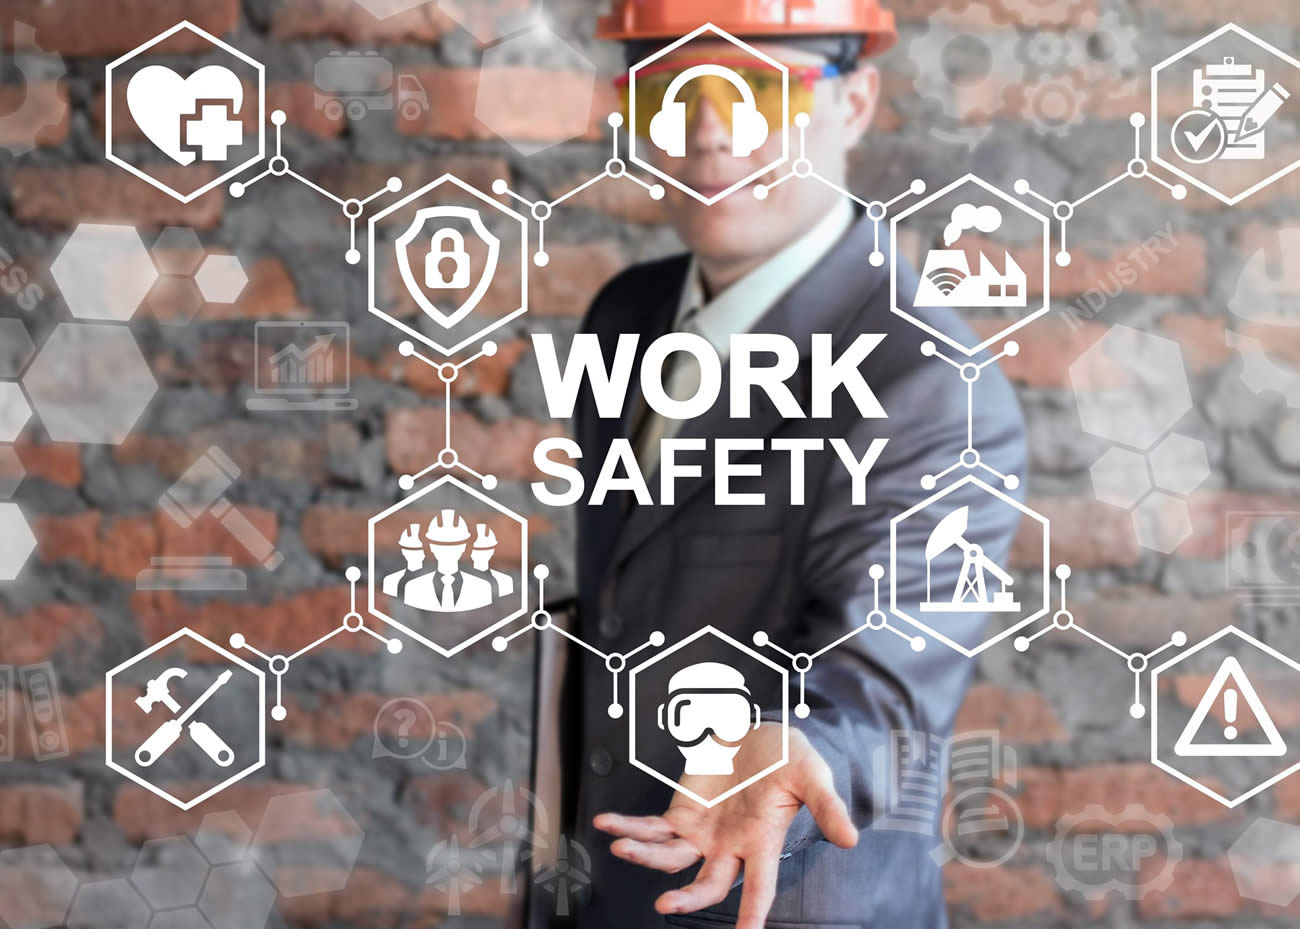 naem-2018-blog-work-safety-concept-regulations-standard-industry-700x500